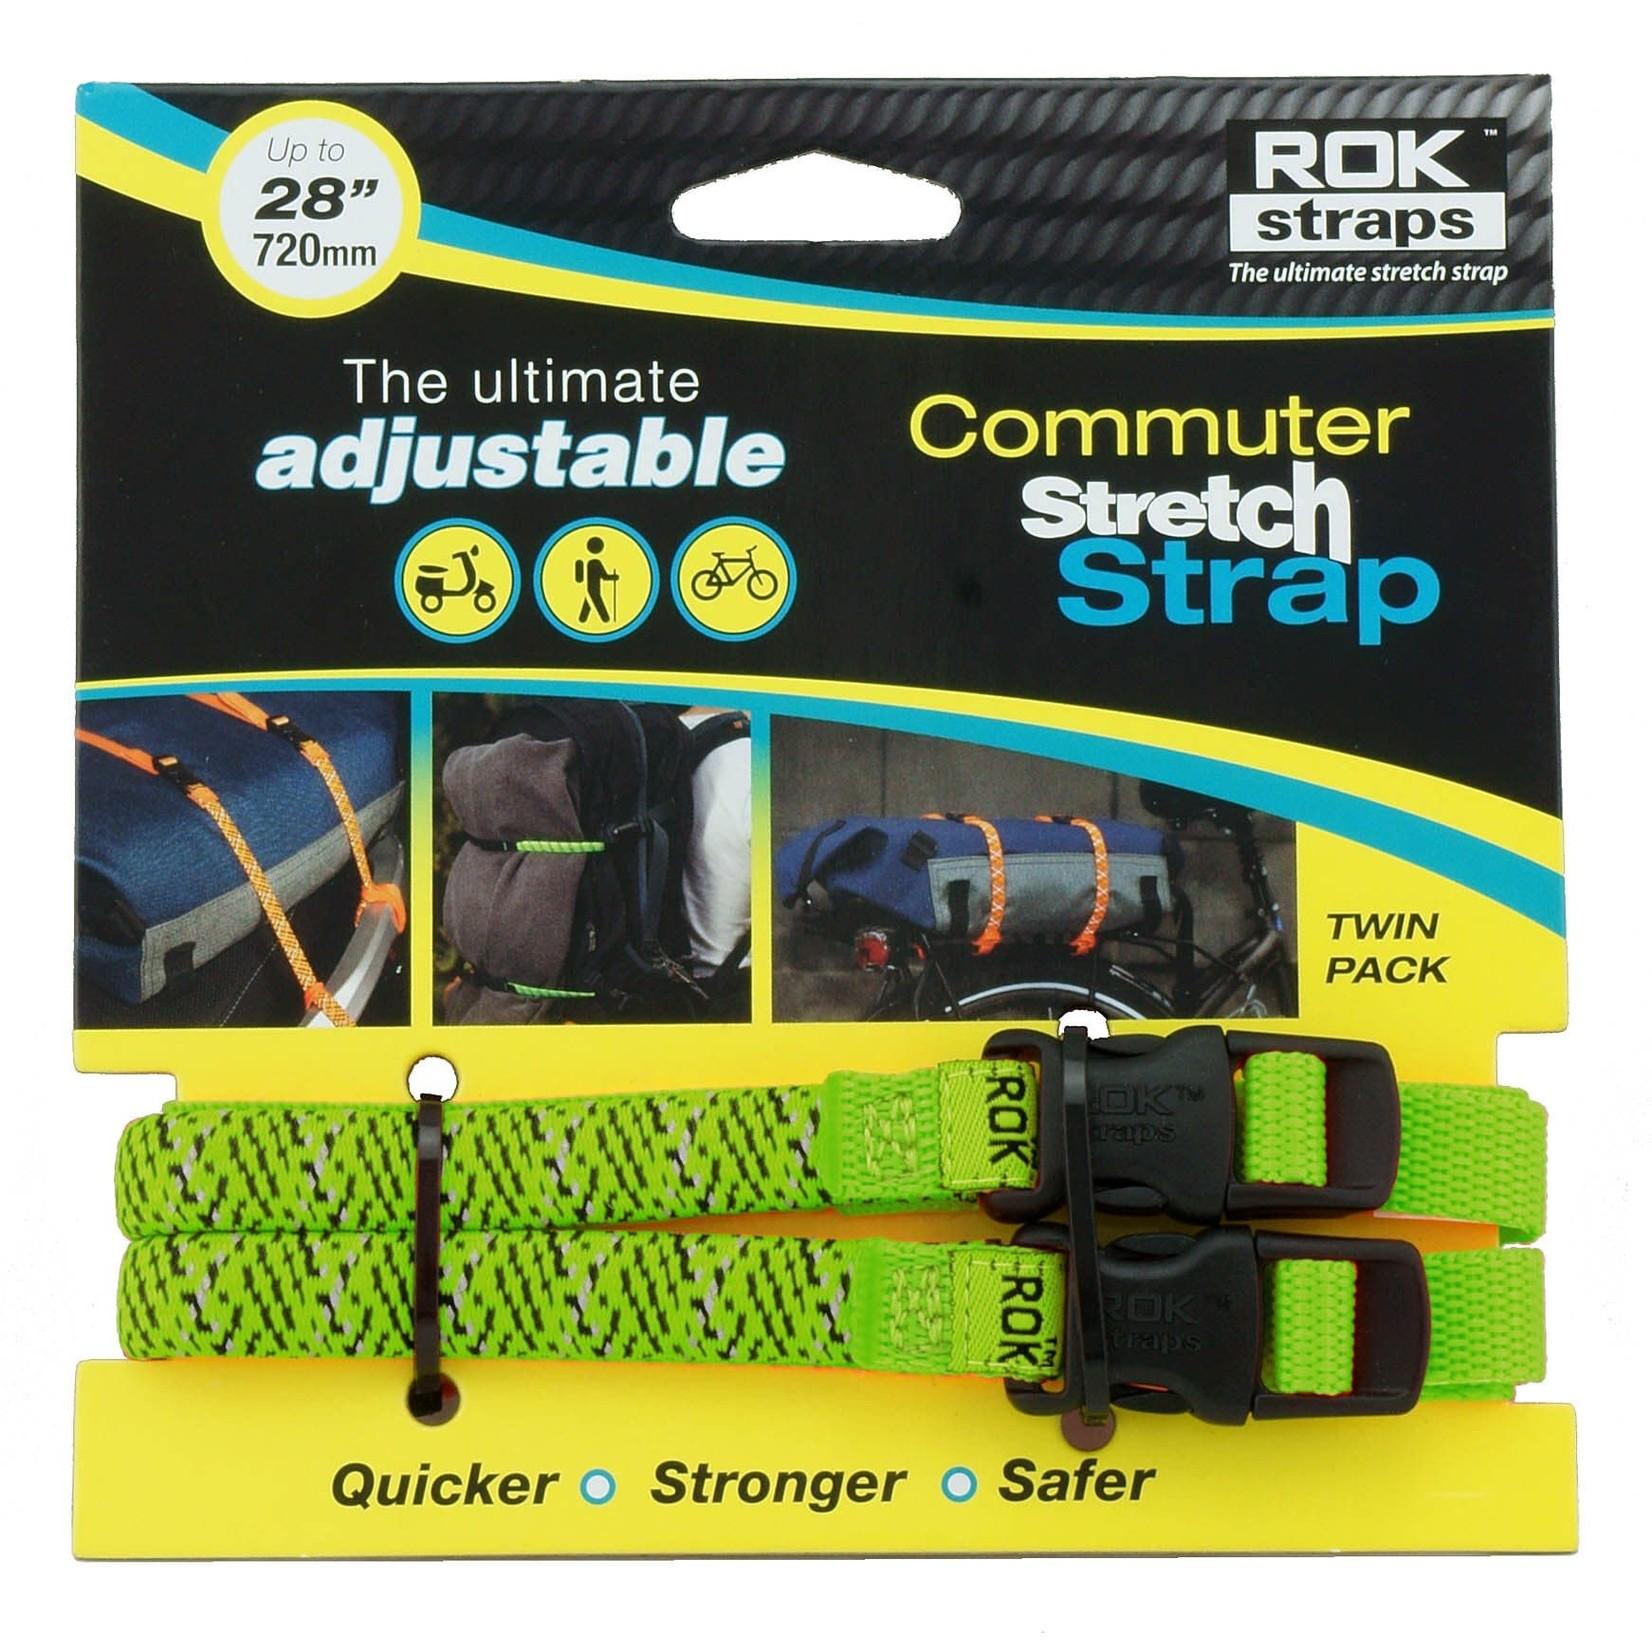 RokStrap Commuter Strap